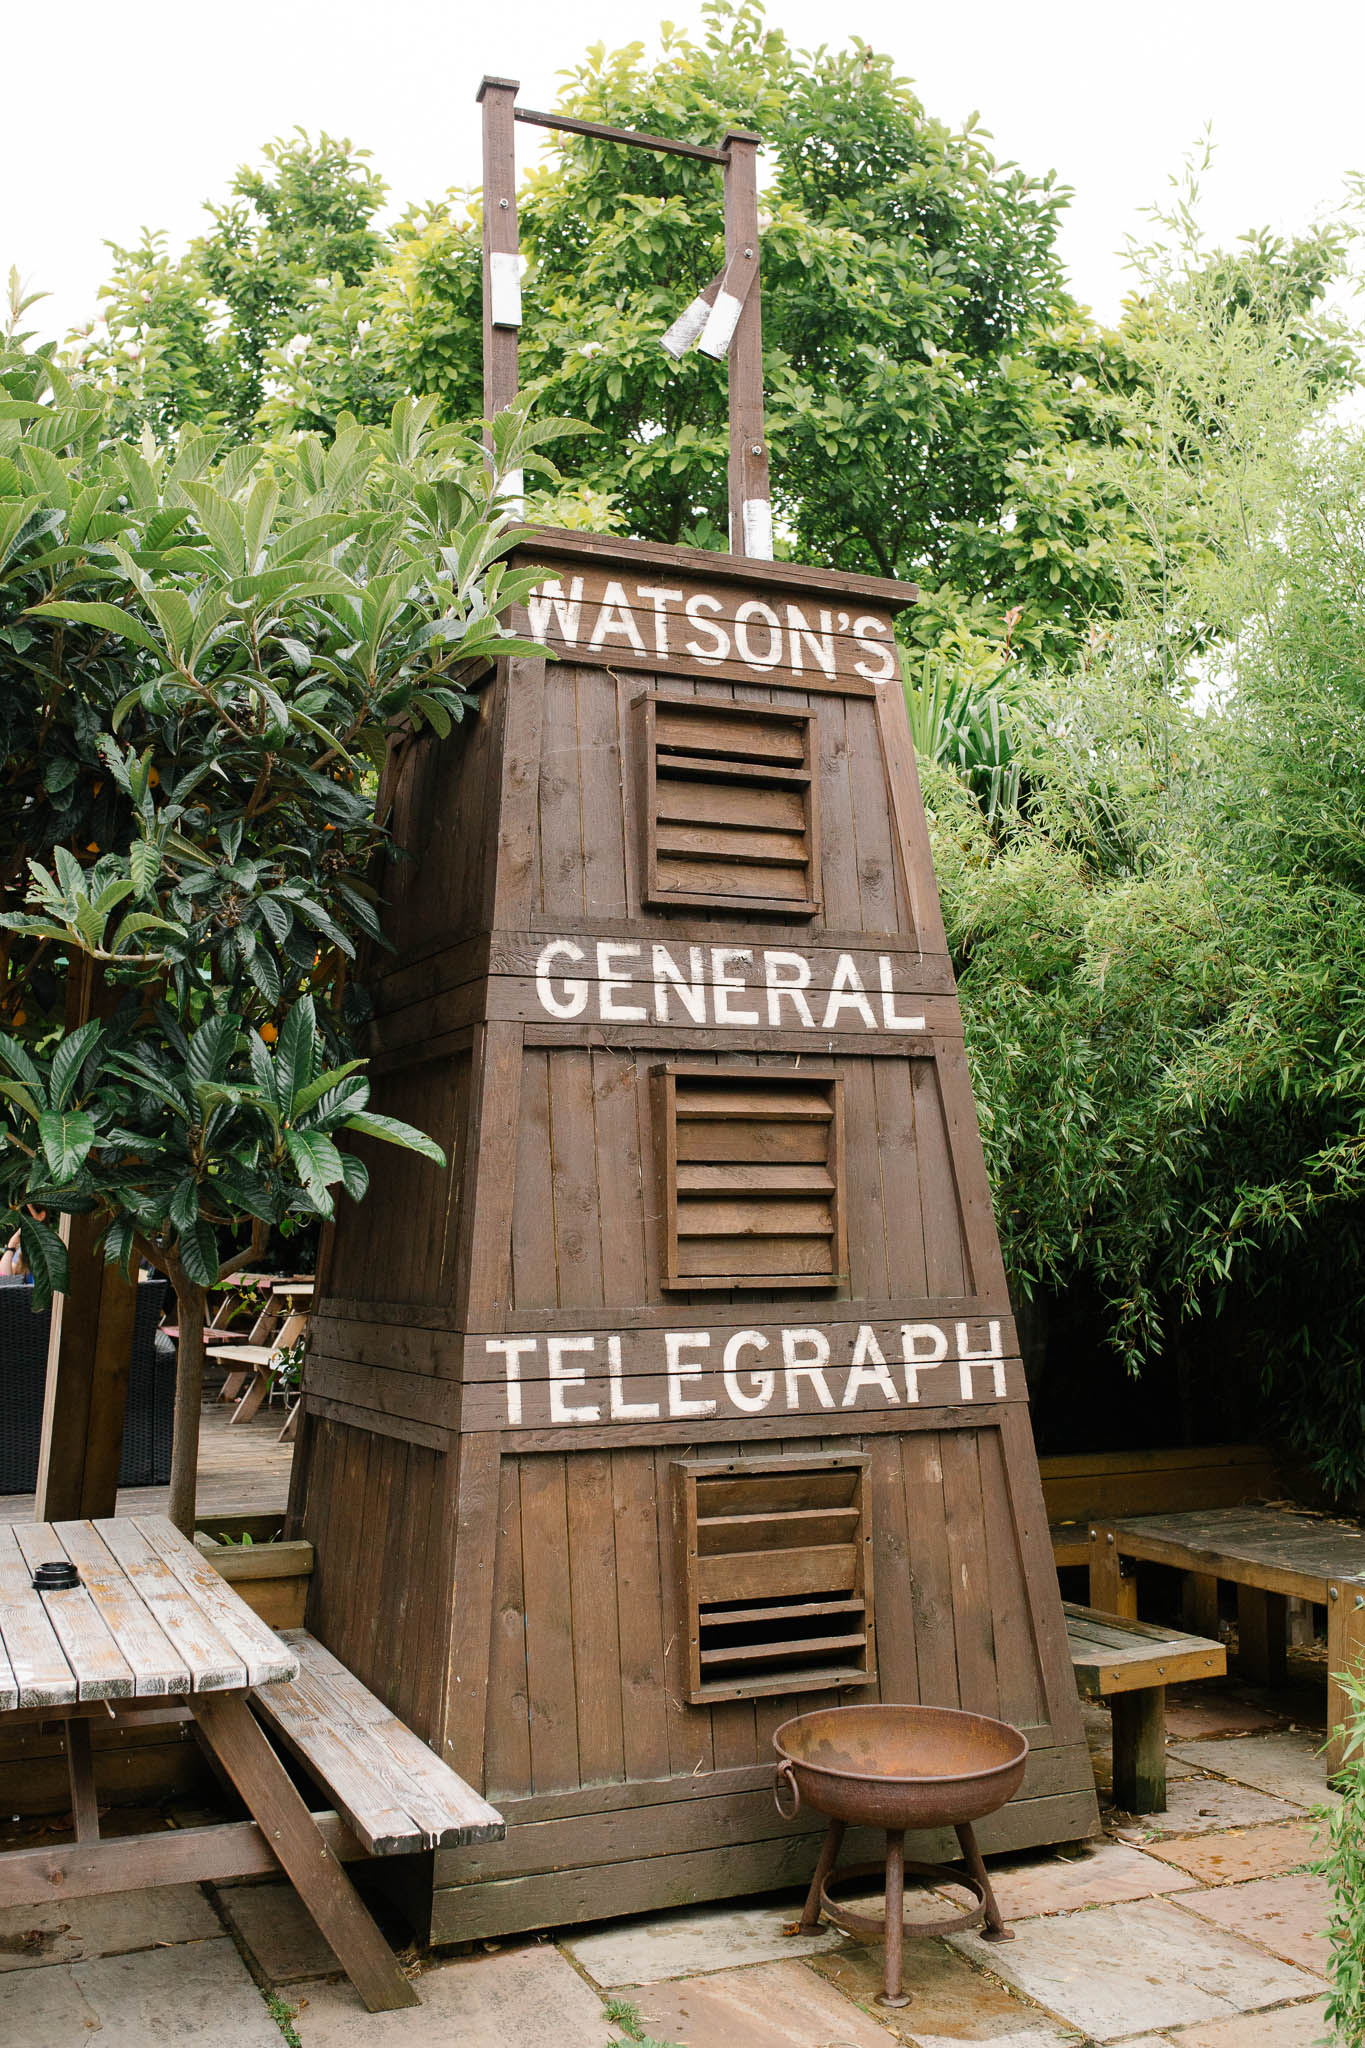 Ellen Richardson - Laine - Watsons General Telegraph-35.jpg